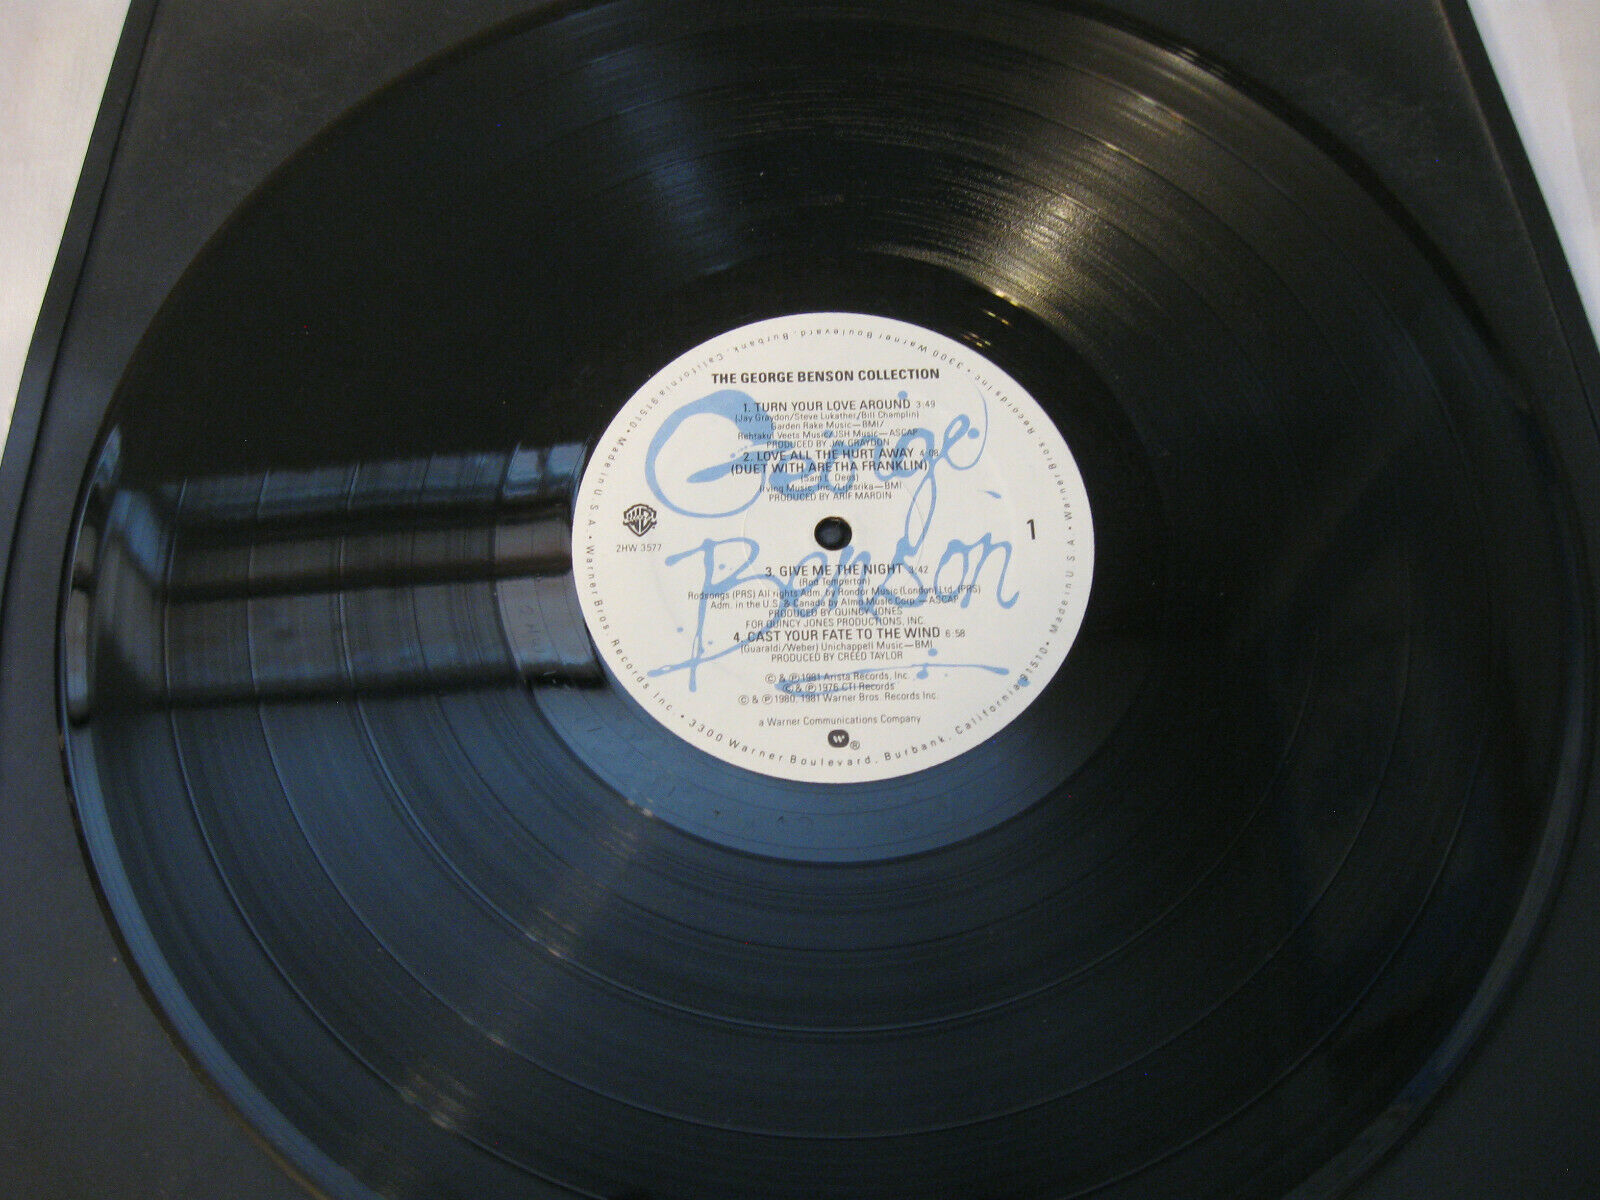 The George Benson Collection Warner Bros 2HW 3577 Stereo Vinyl Record LP Album image 4